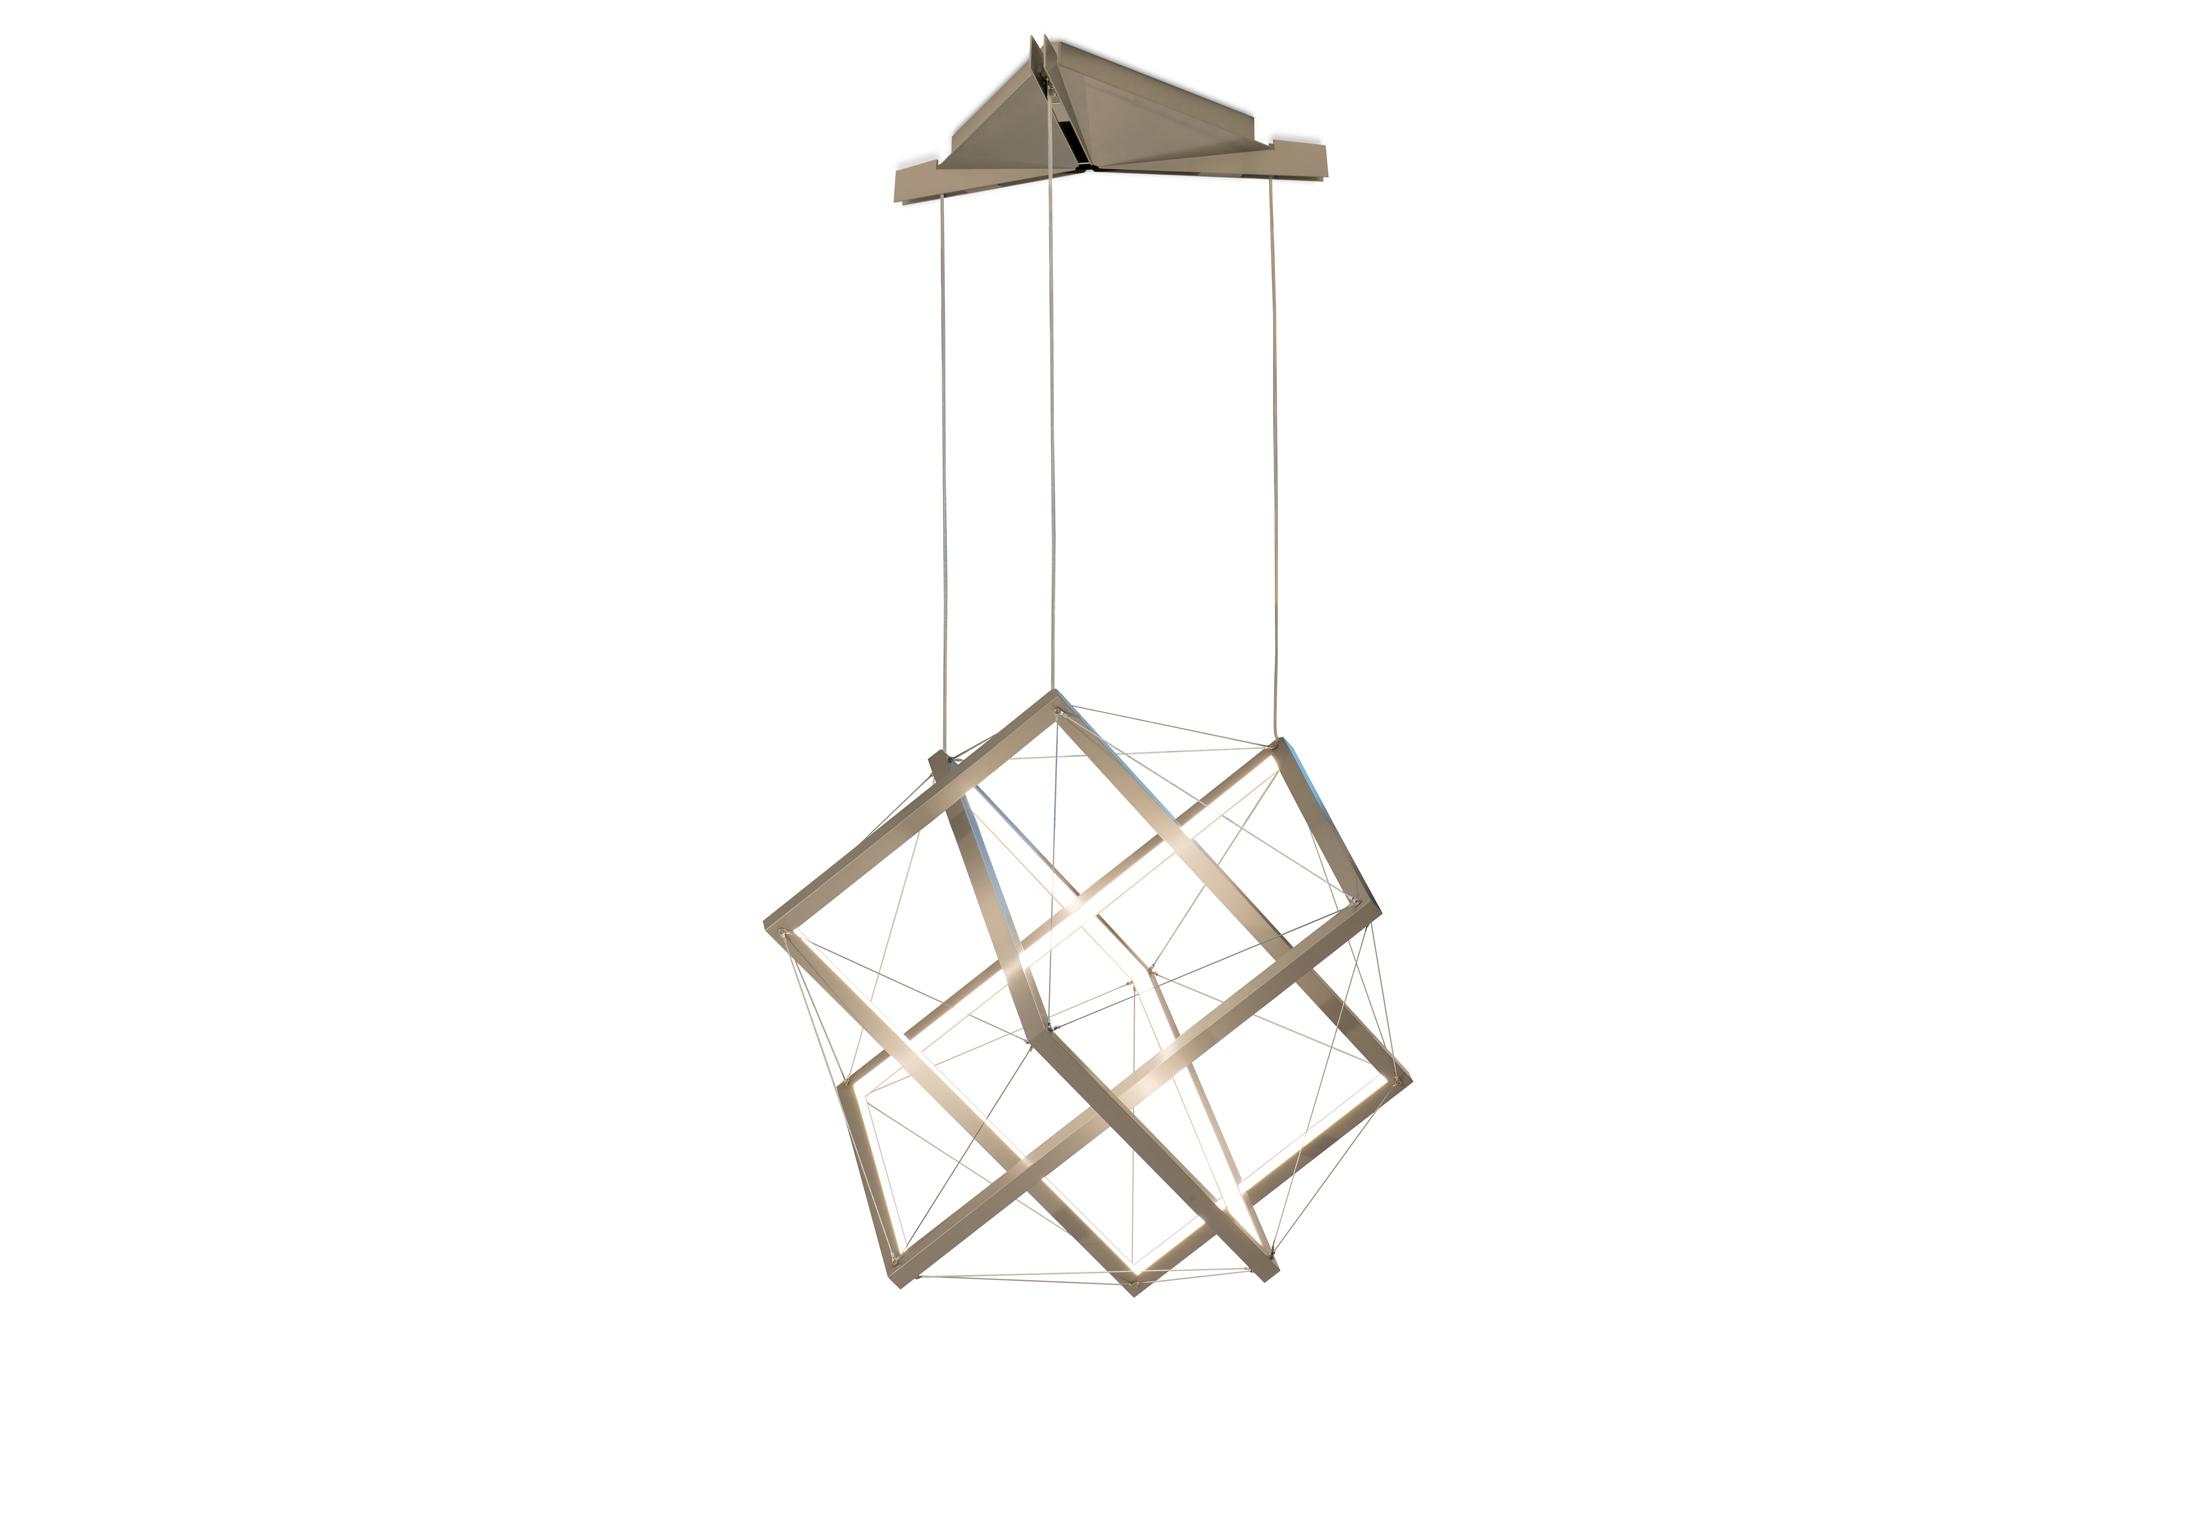 goldener schnitt von mawadesign stylepark. Black Bedroom Furniture Sets. Home Design Ideas